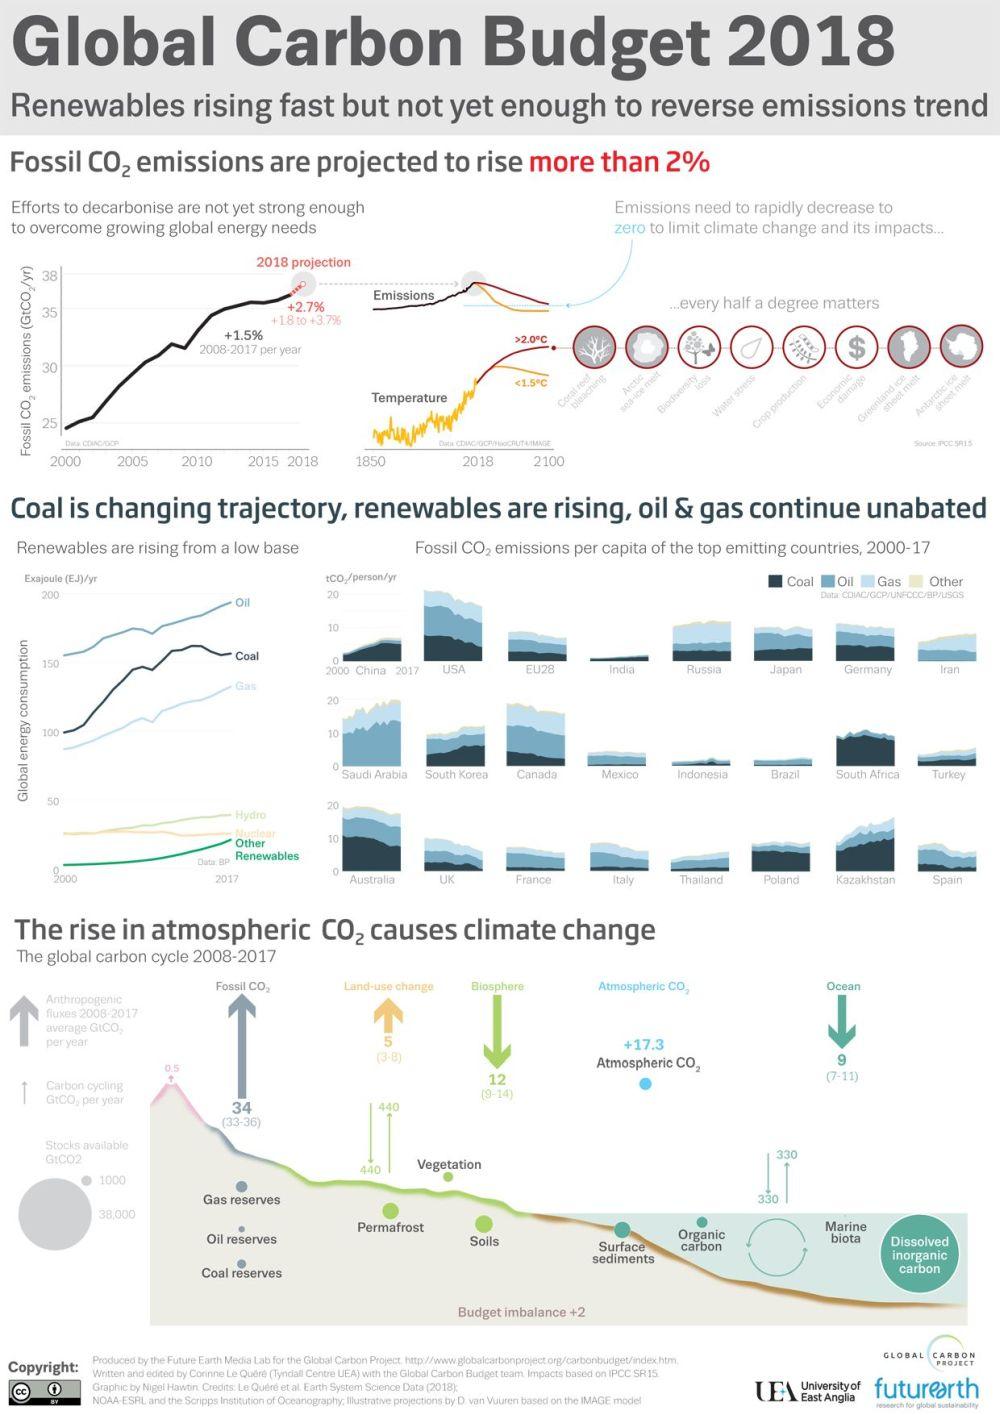 global carbon budget 2018